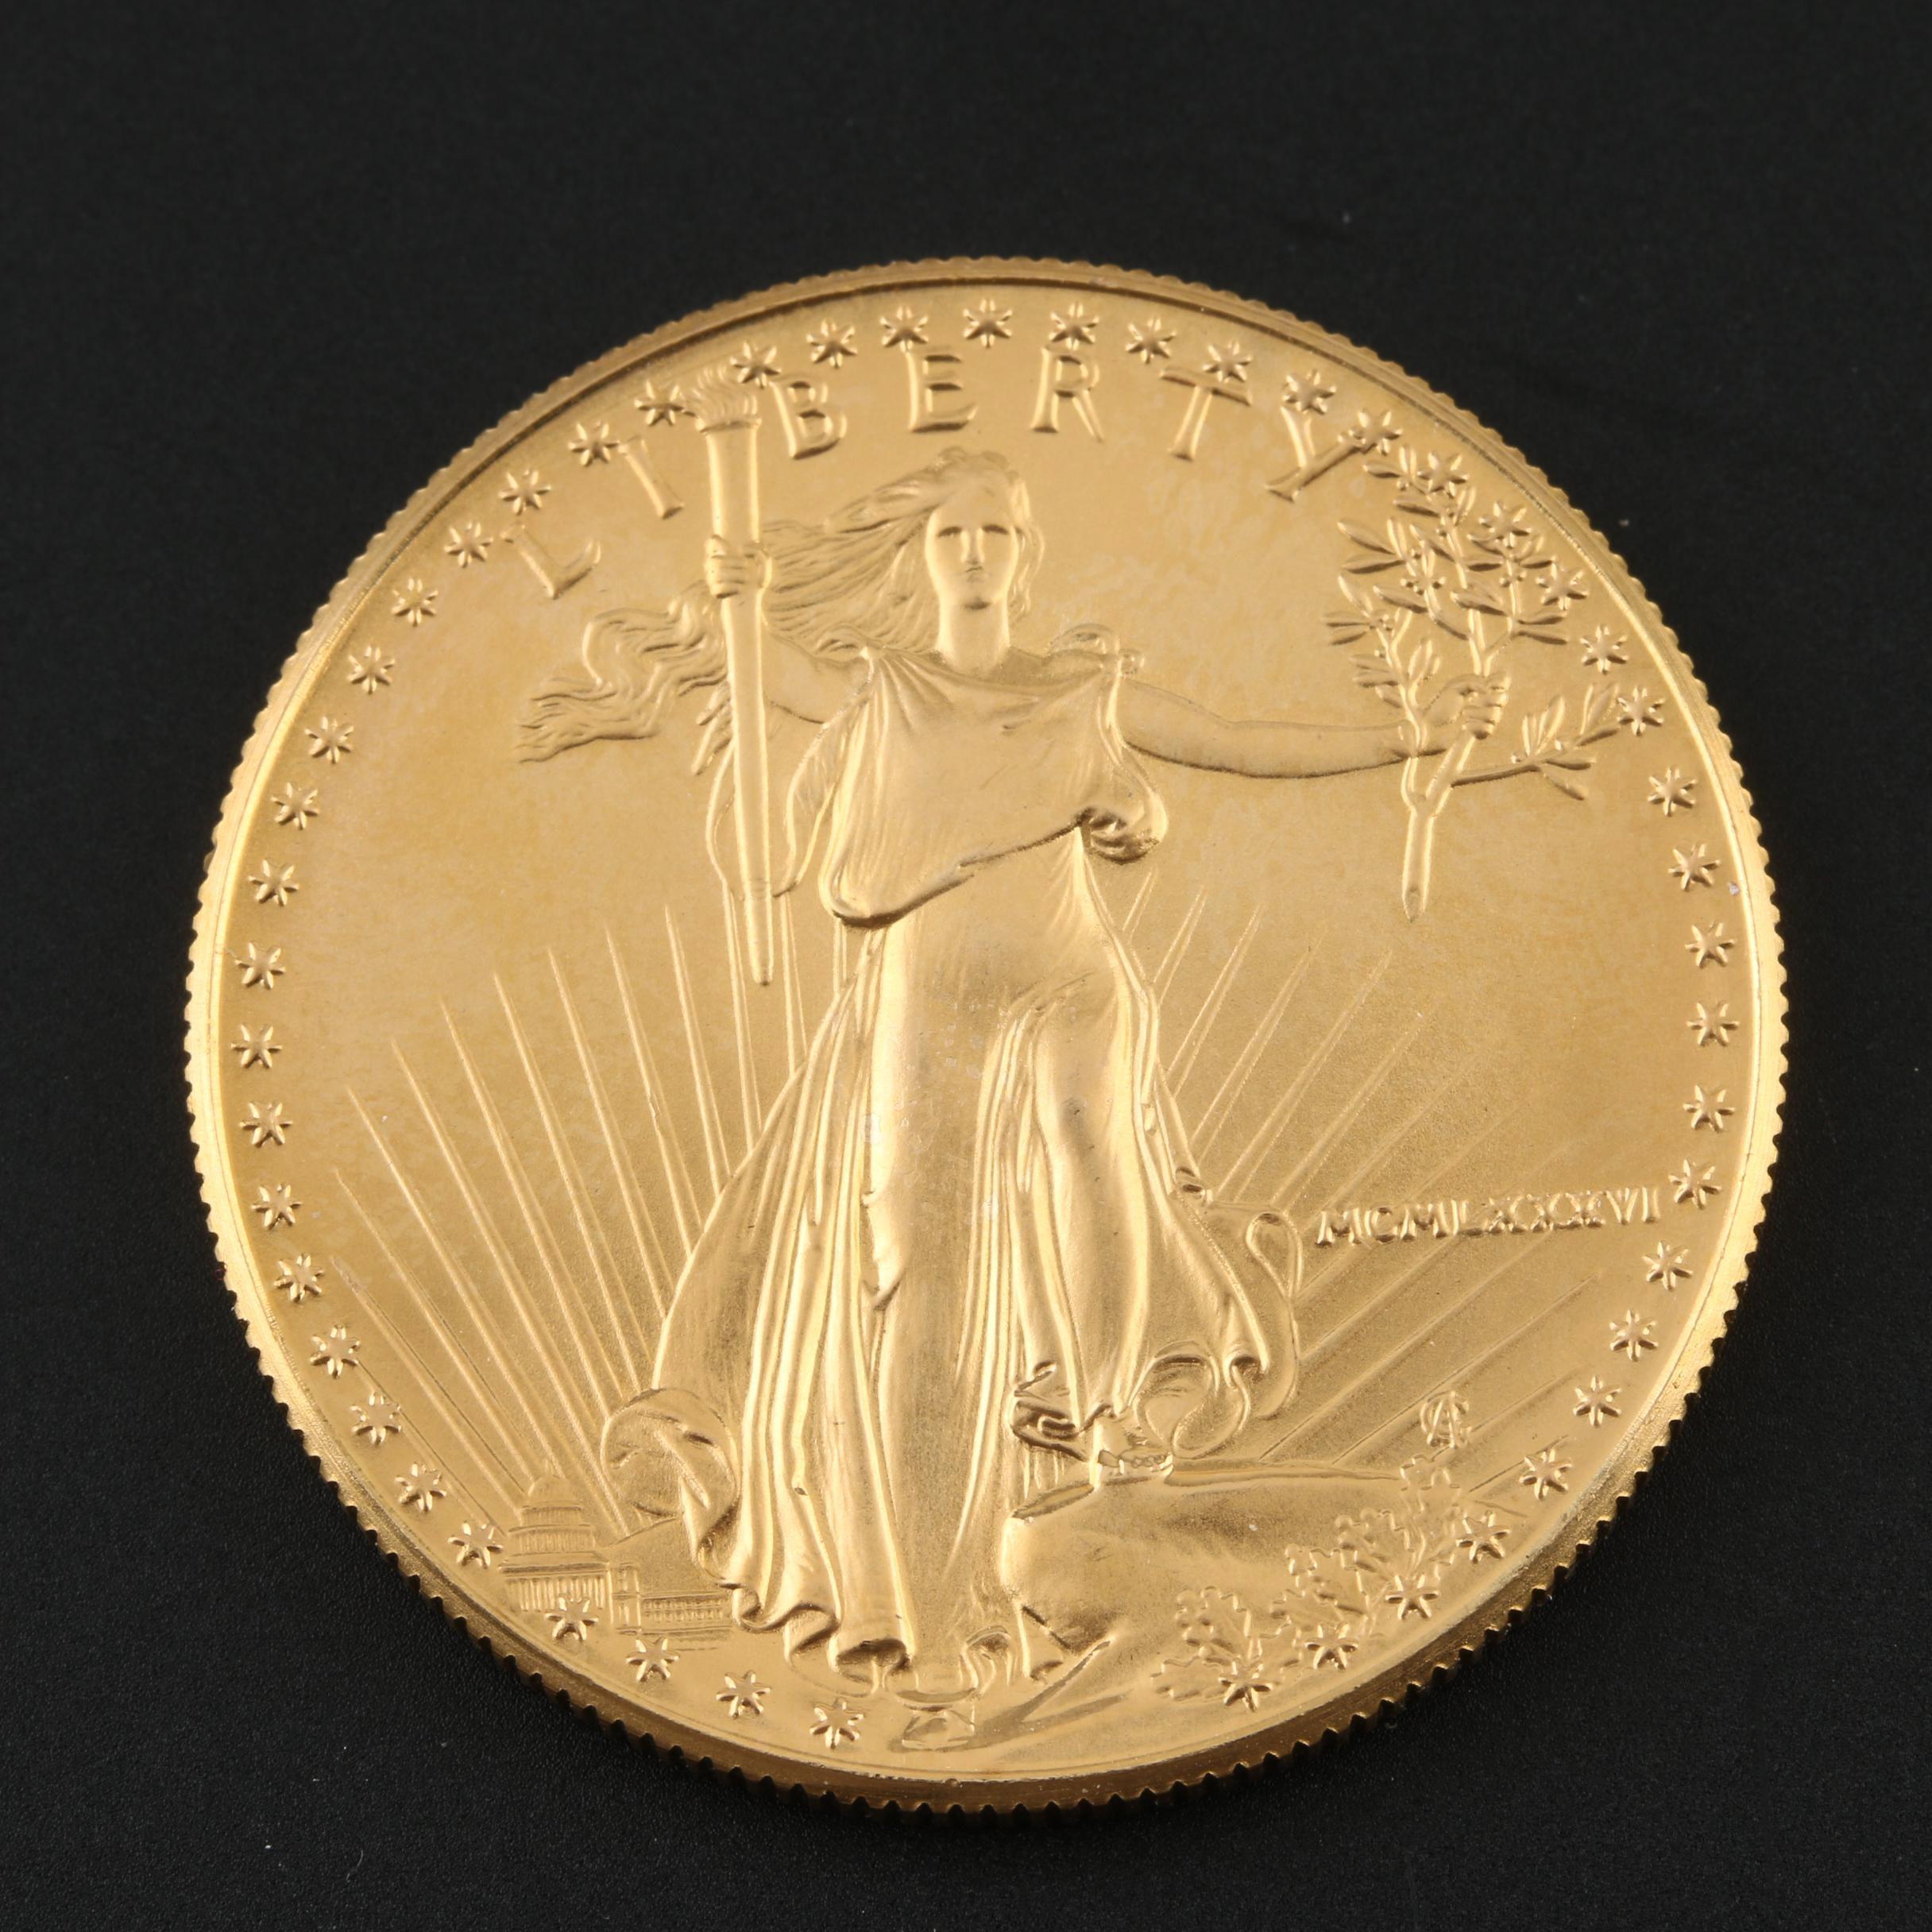 1986 $50 Gold Eagle Bullion Coin